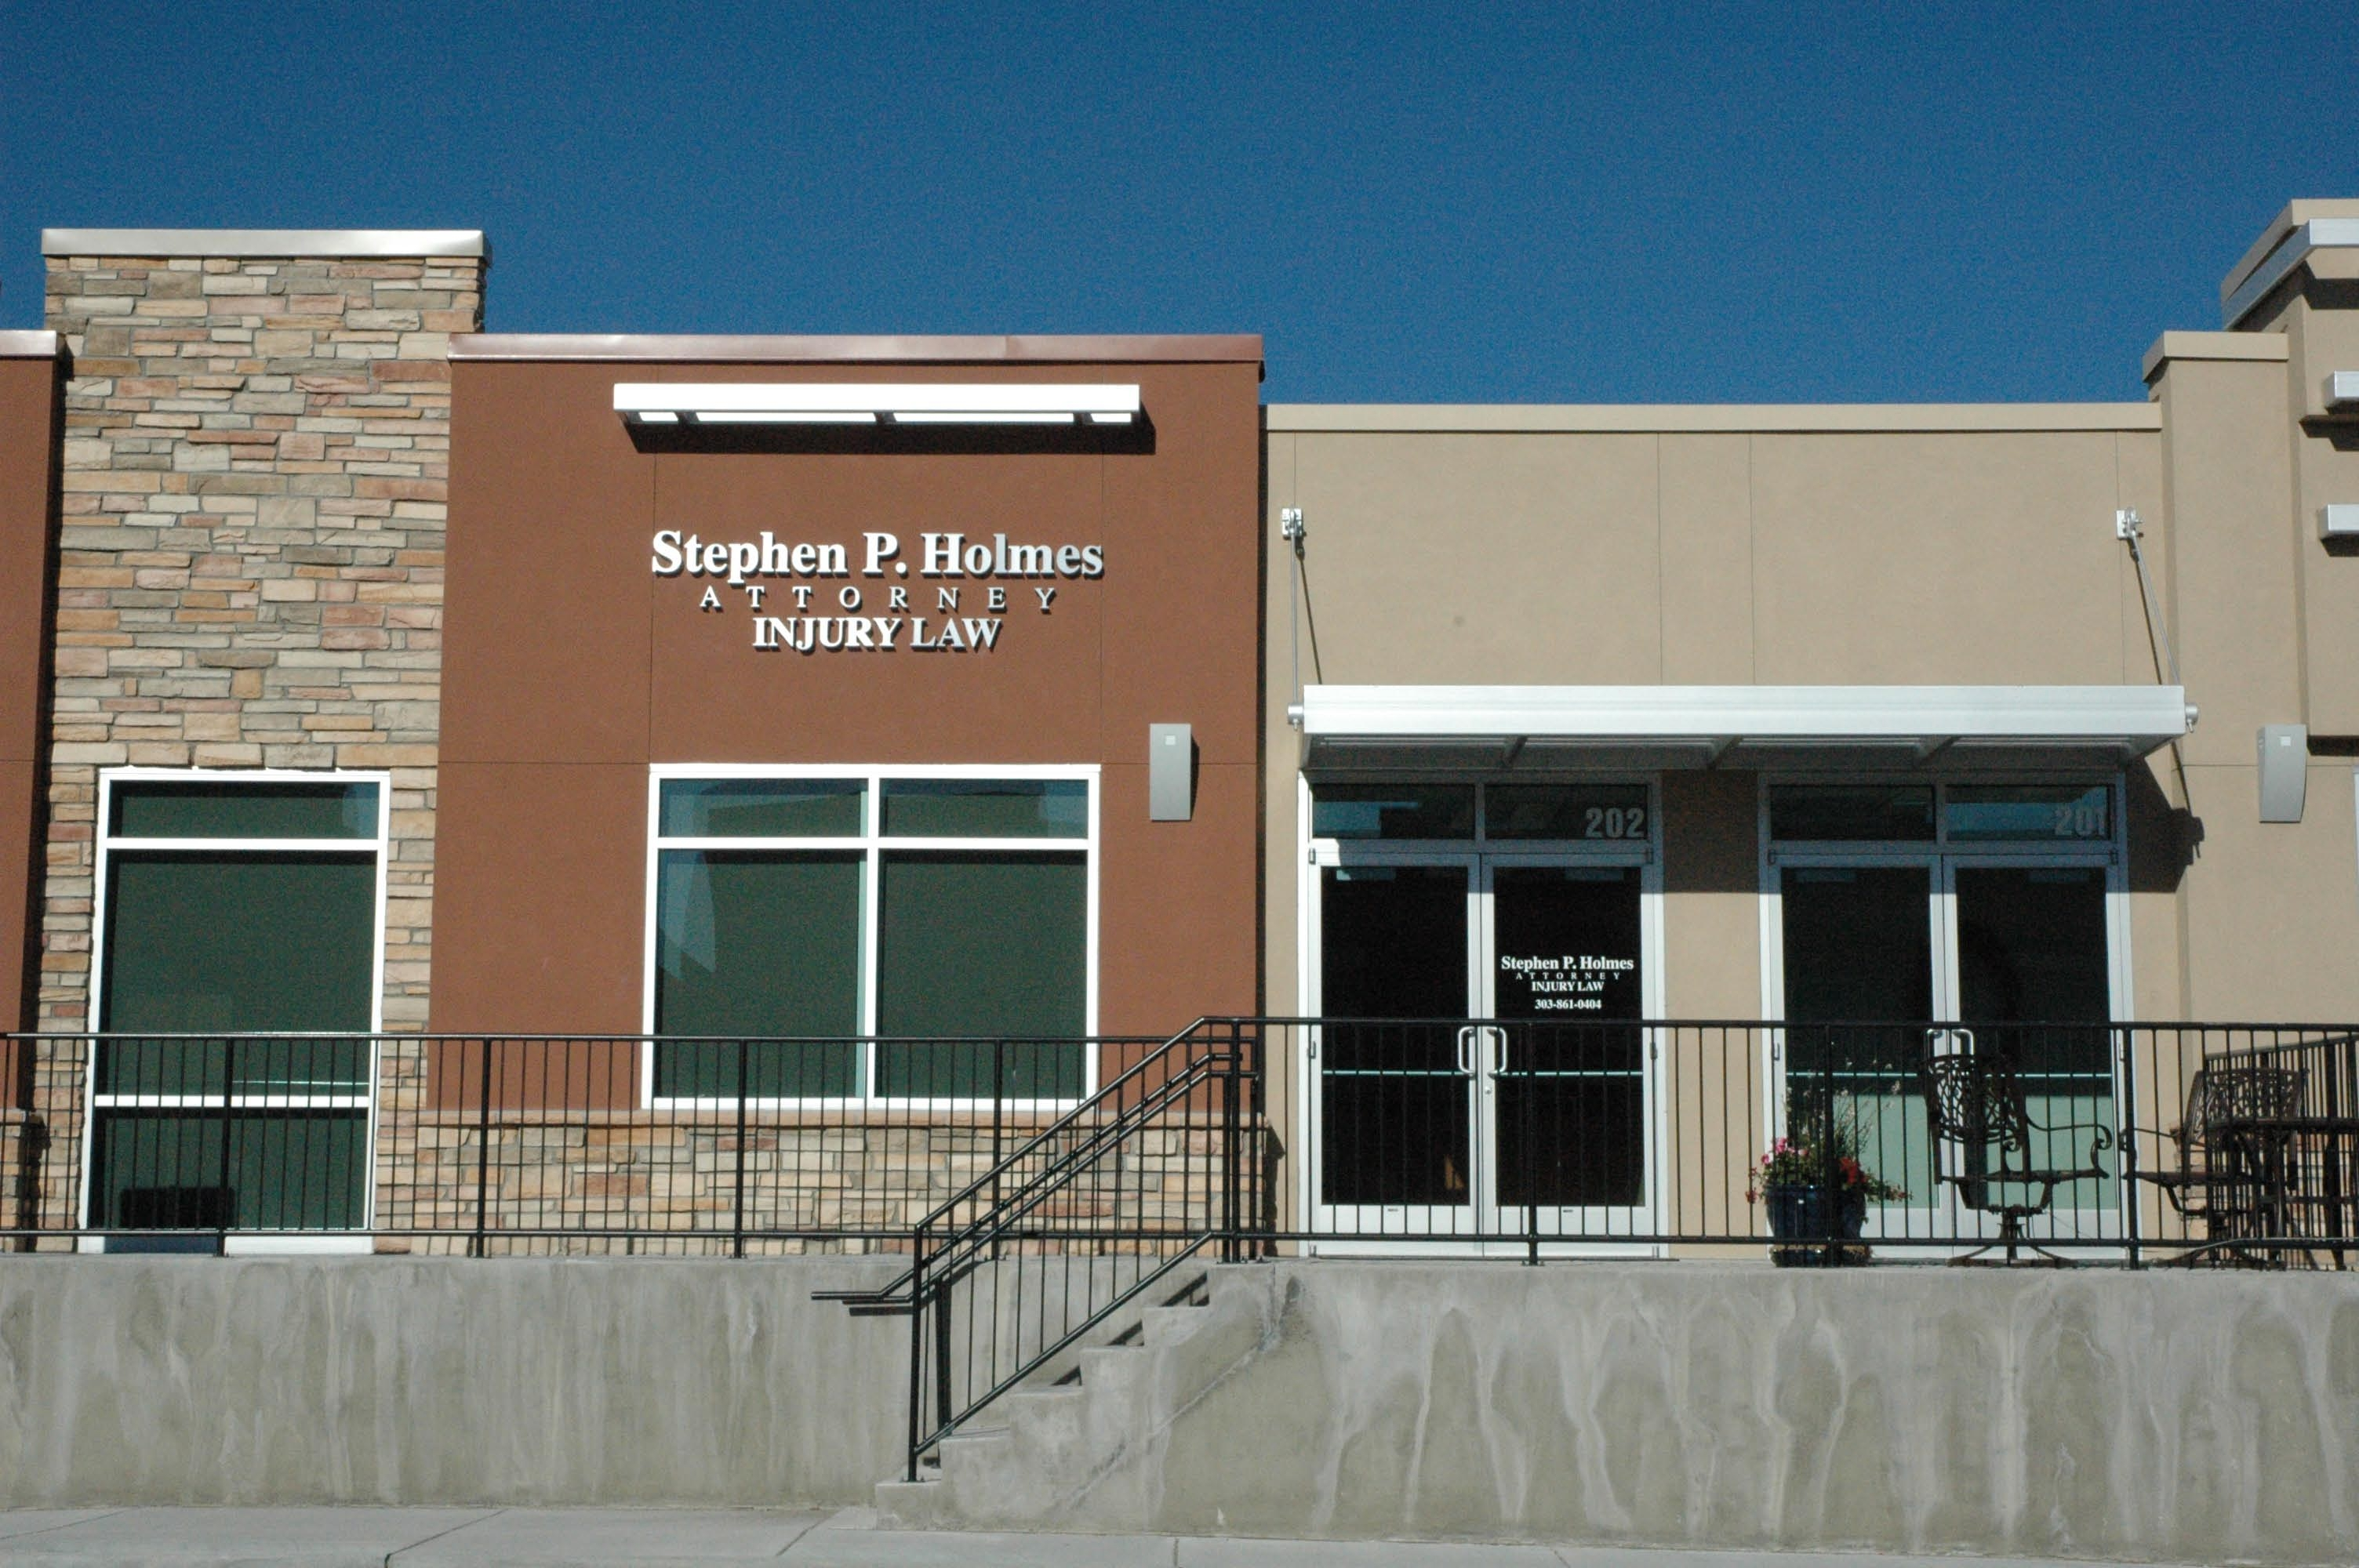 Stephen P. Holmes image 3